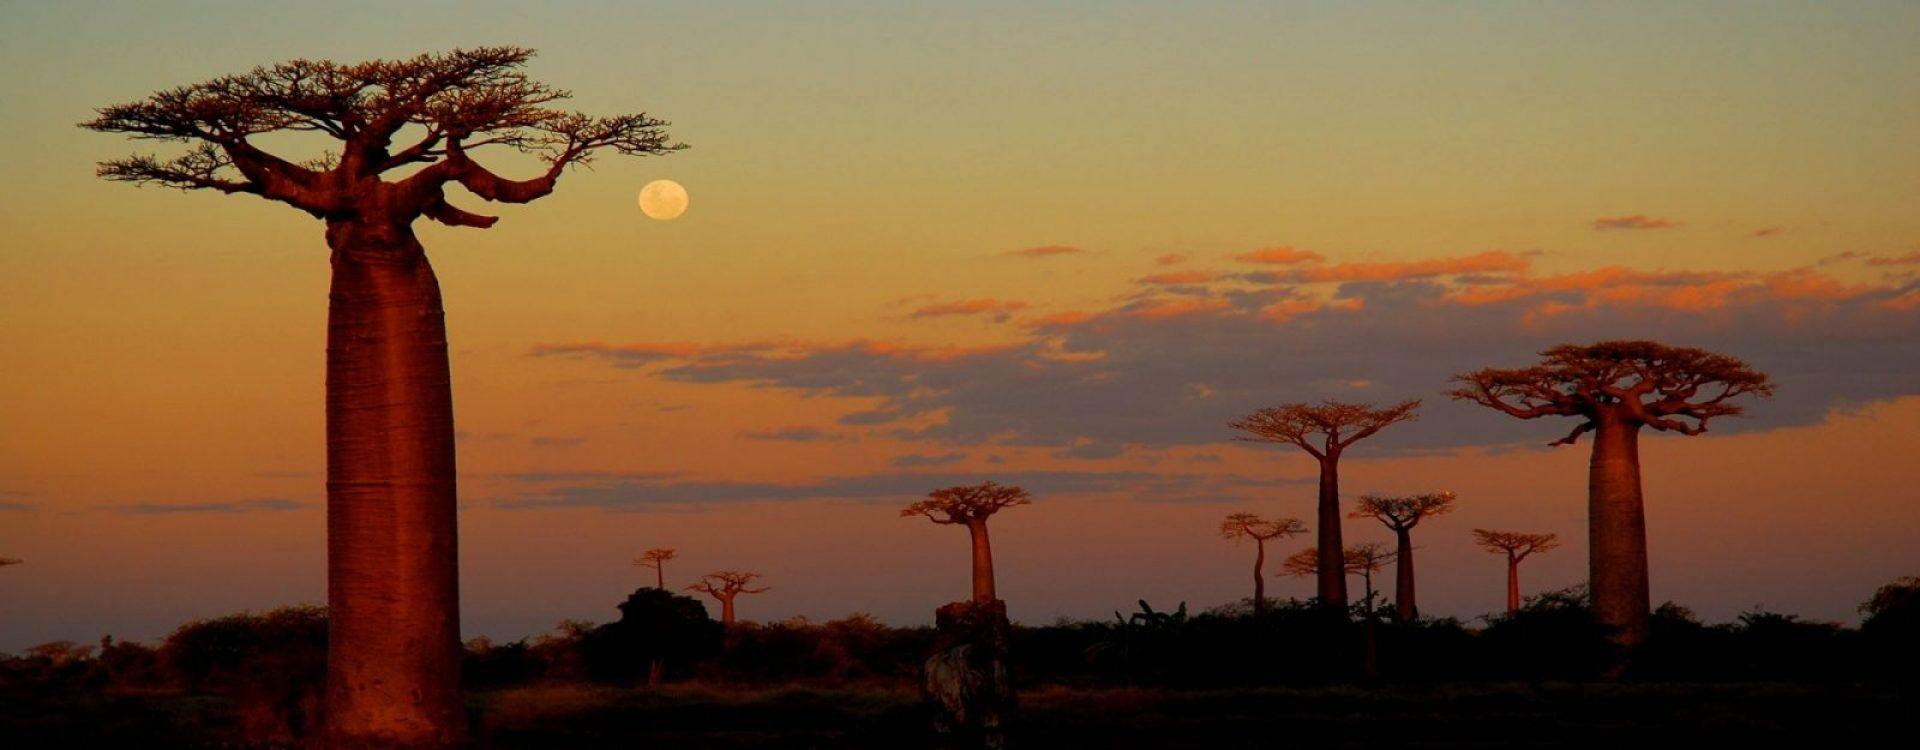 Morondava - Avenue of the Baobabs